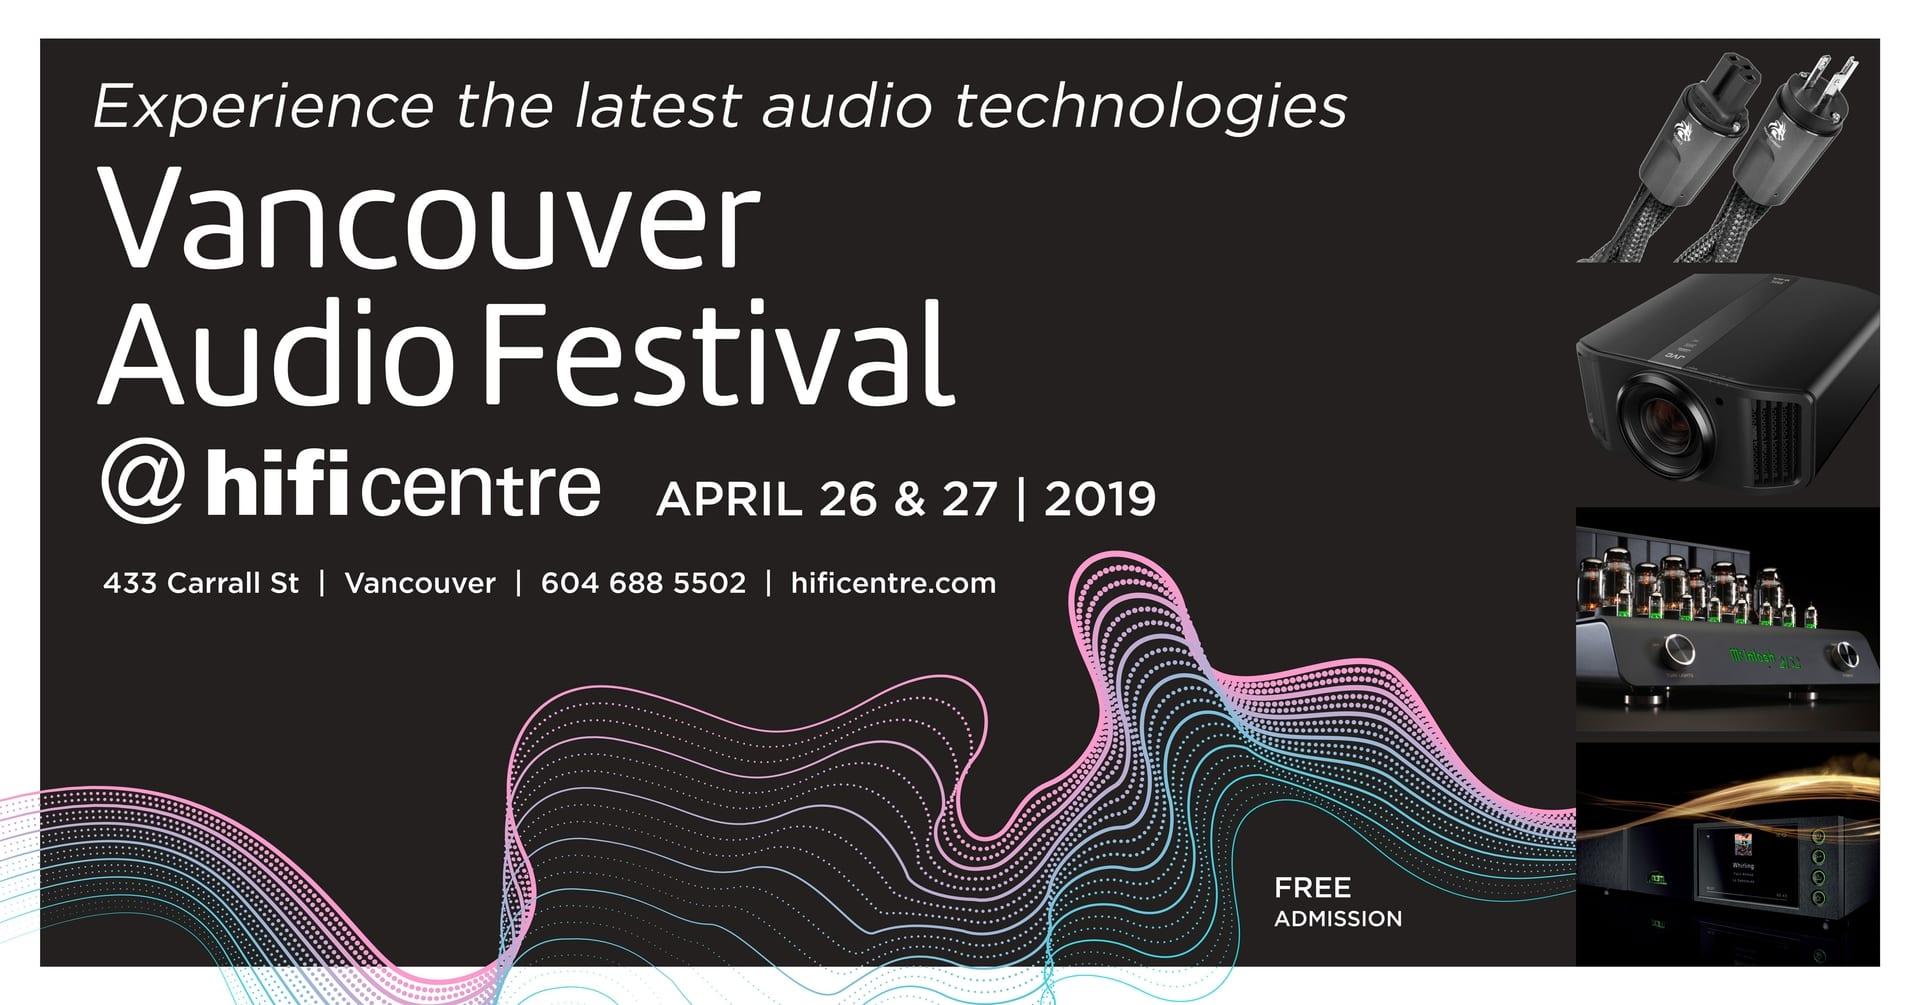 Hi-Fi Centre to Host Vancouver Audio Festival 2019